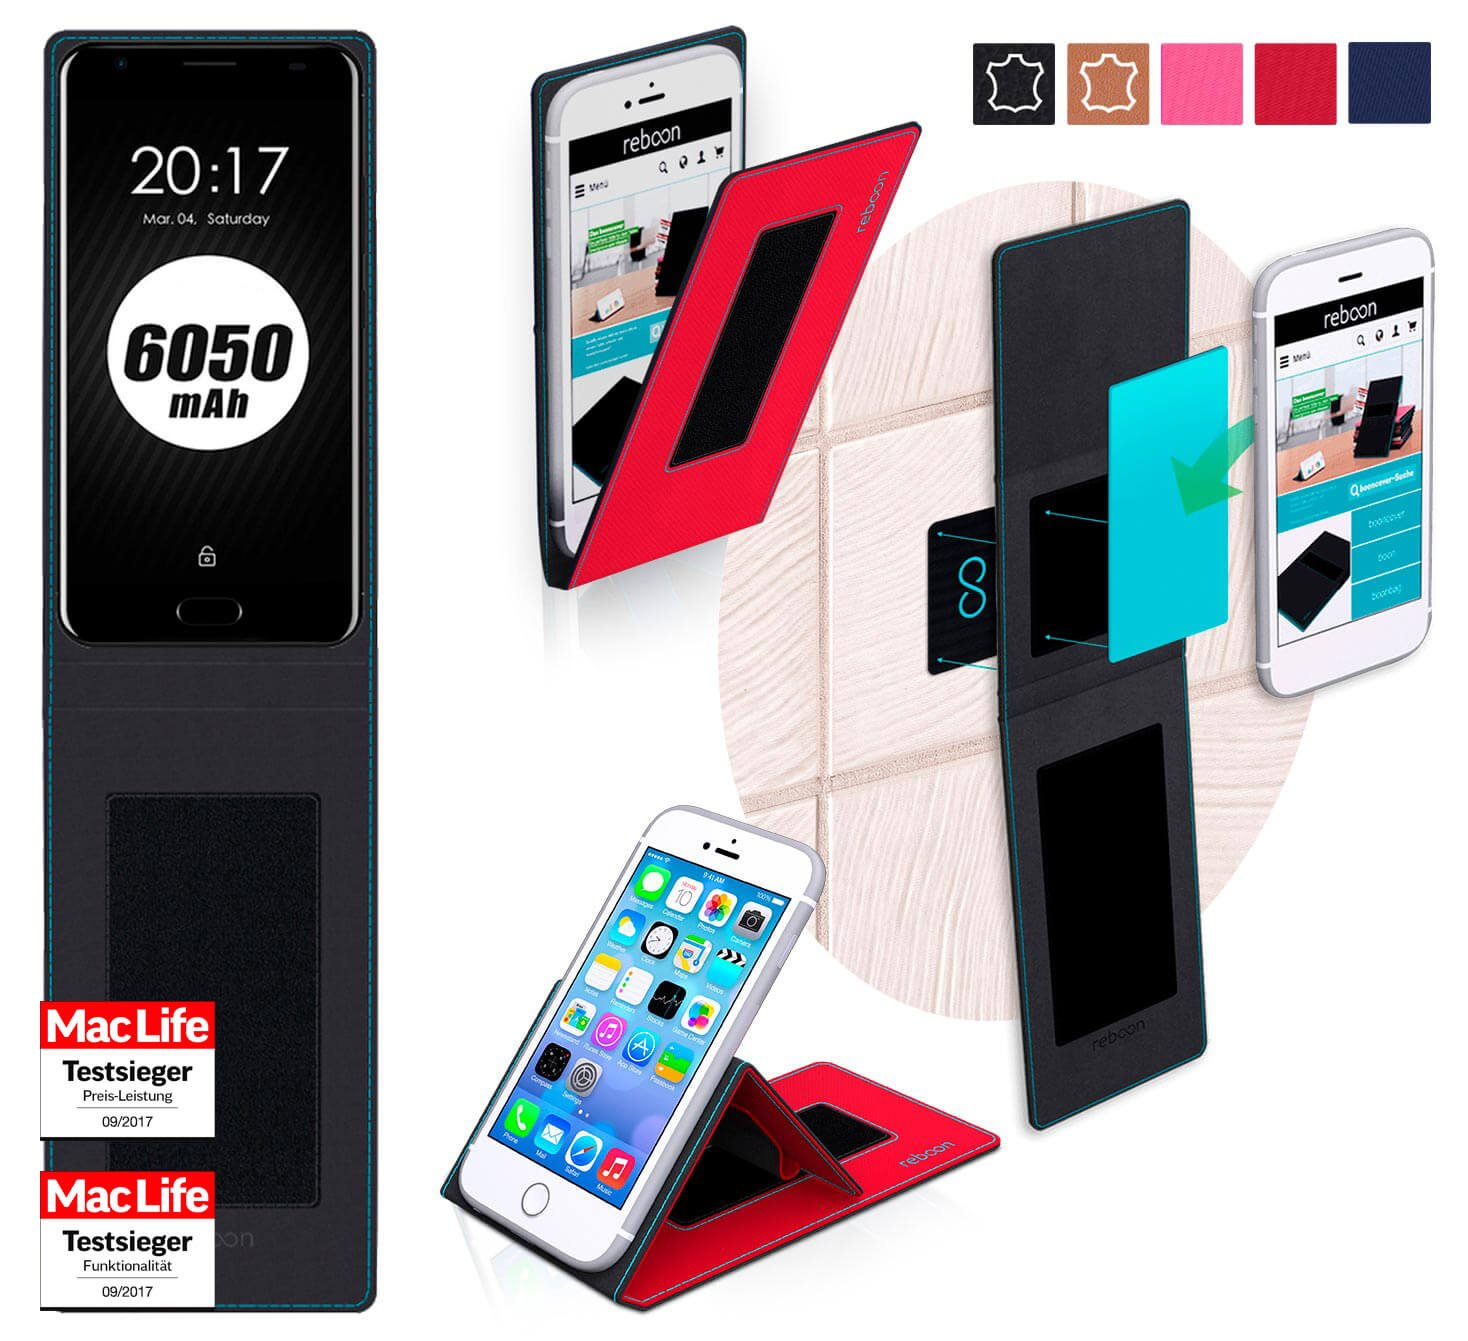 reboon Funda Ulefone Power 2 | in Rojo | Carcasa Multifuncional Case Cover